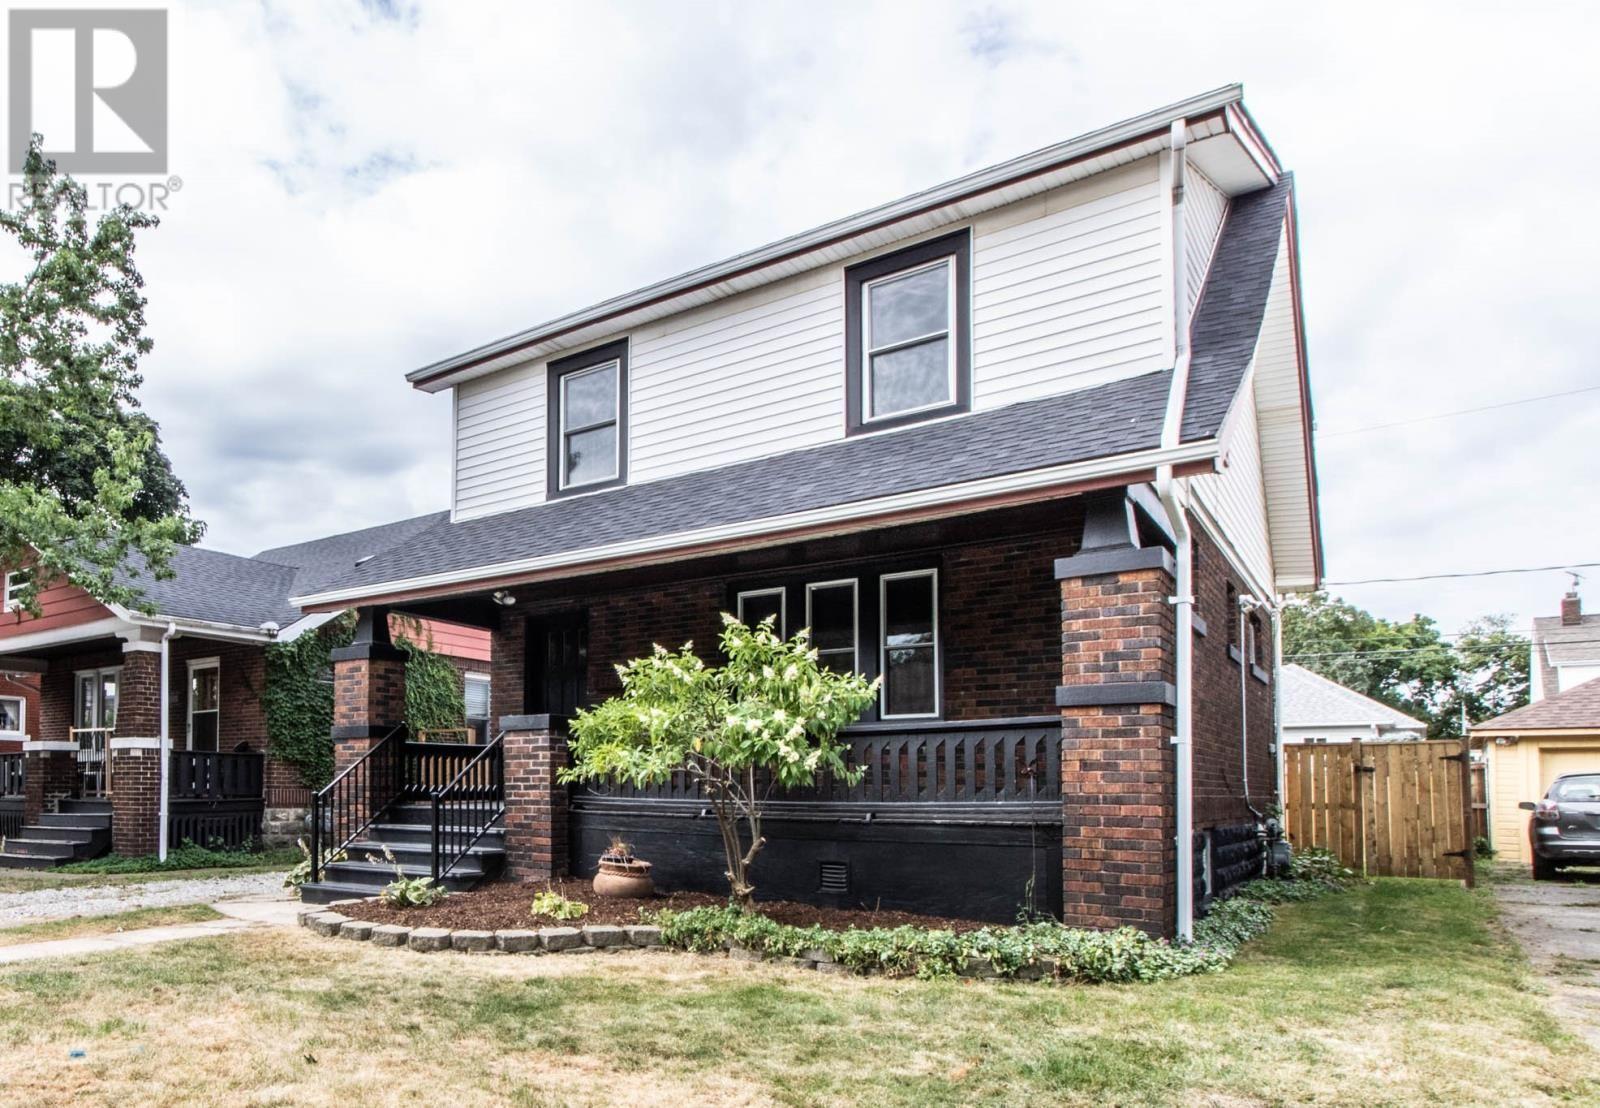 MLS 19026246 2179 WINDERMERE, Windsor, Canada Property